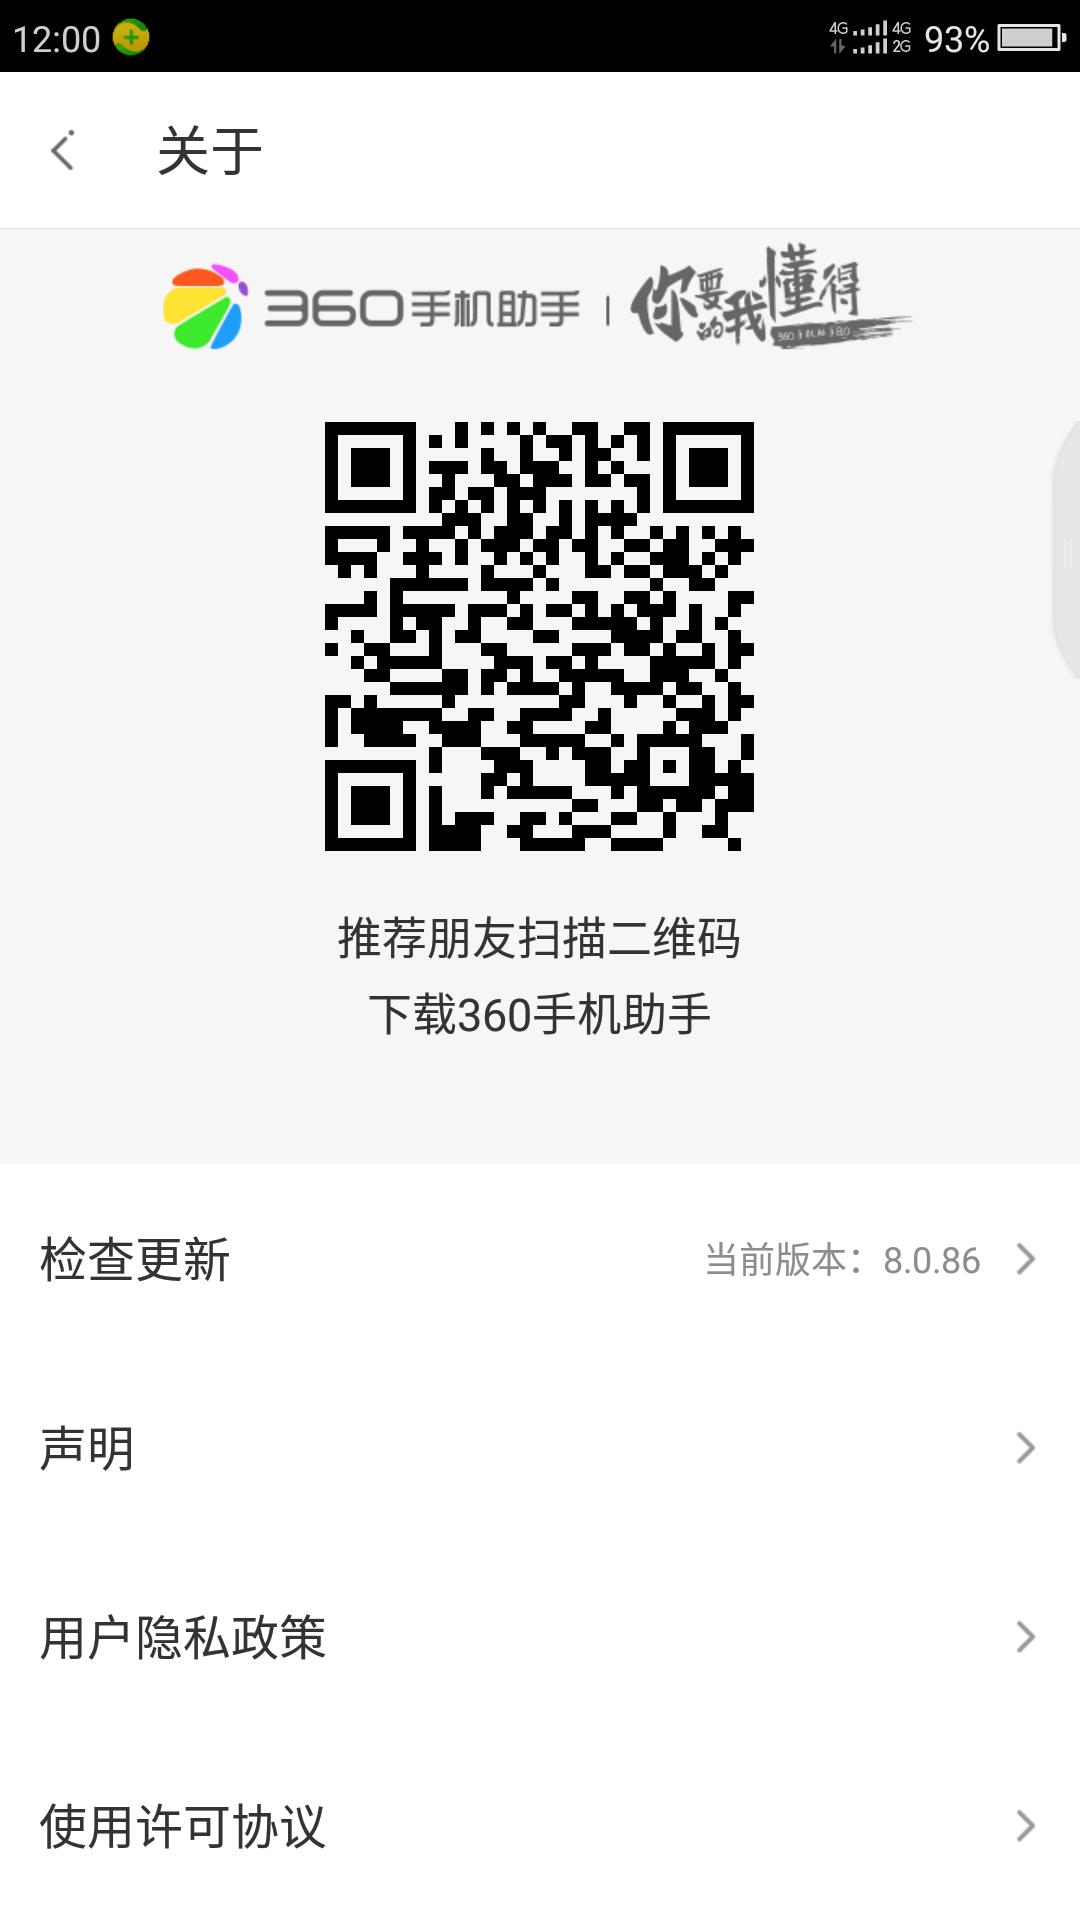 Screenshot_2019-04-30-12-01-00.png